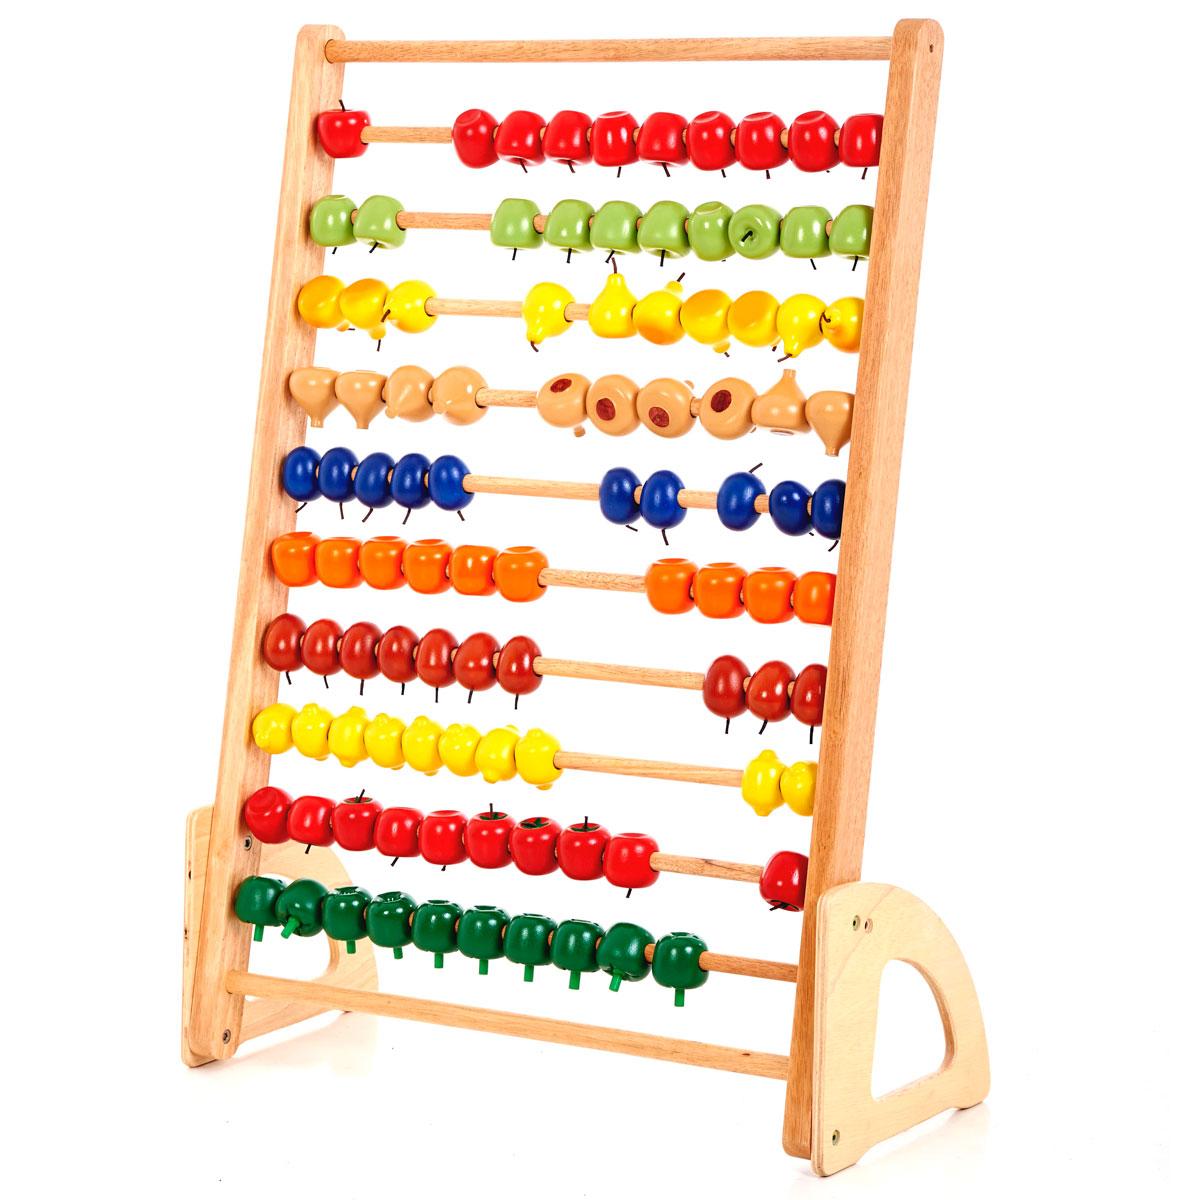 Stem School Ypsilanti: Buy Giant Fruit Abacus CD95640